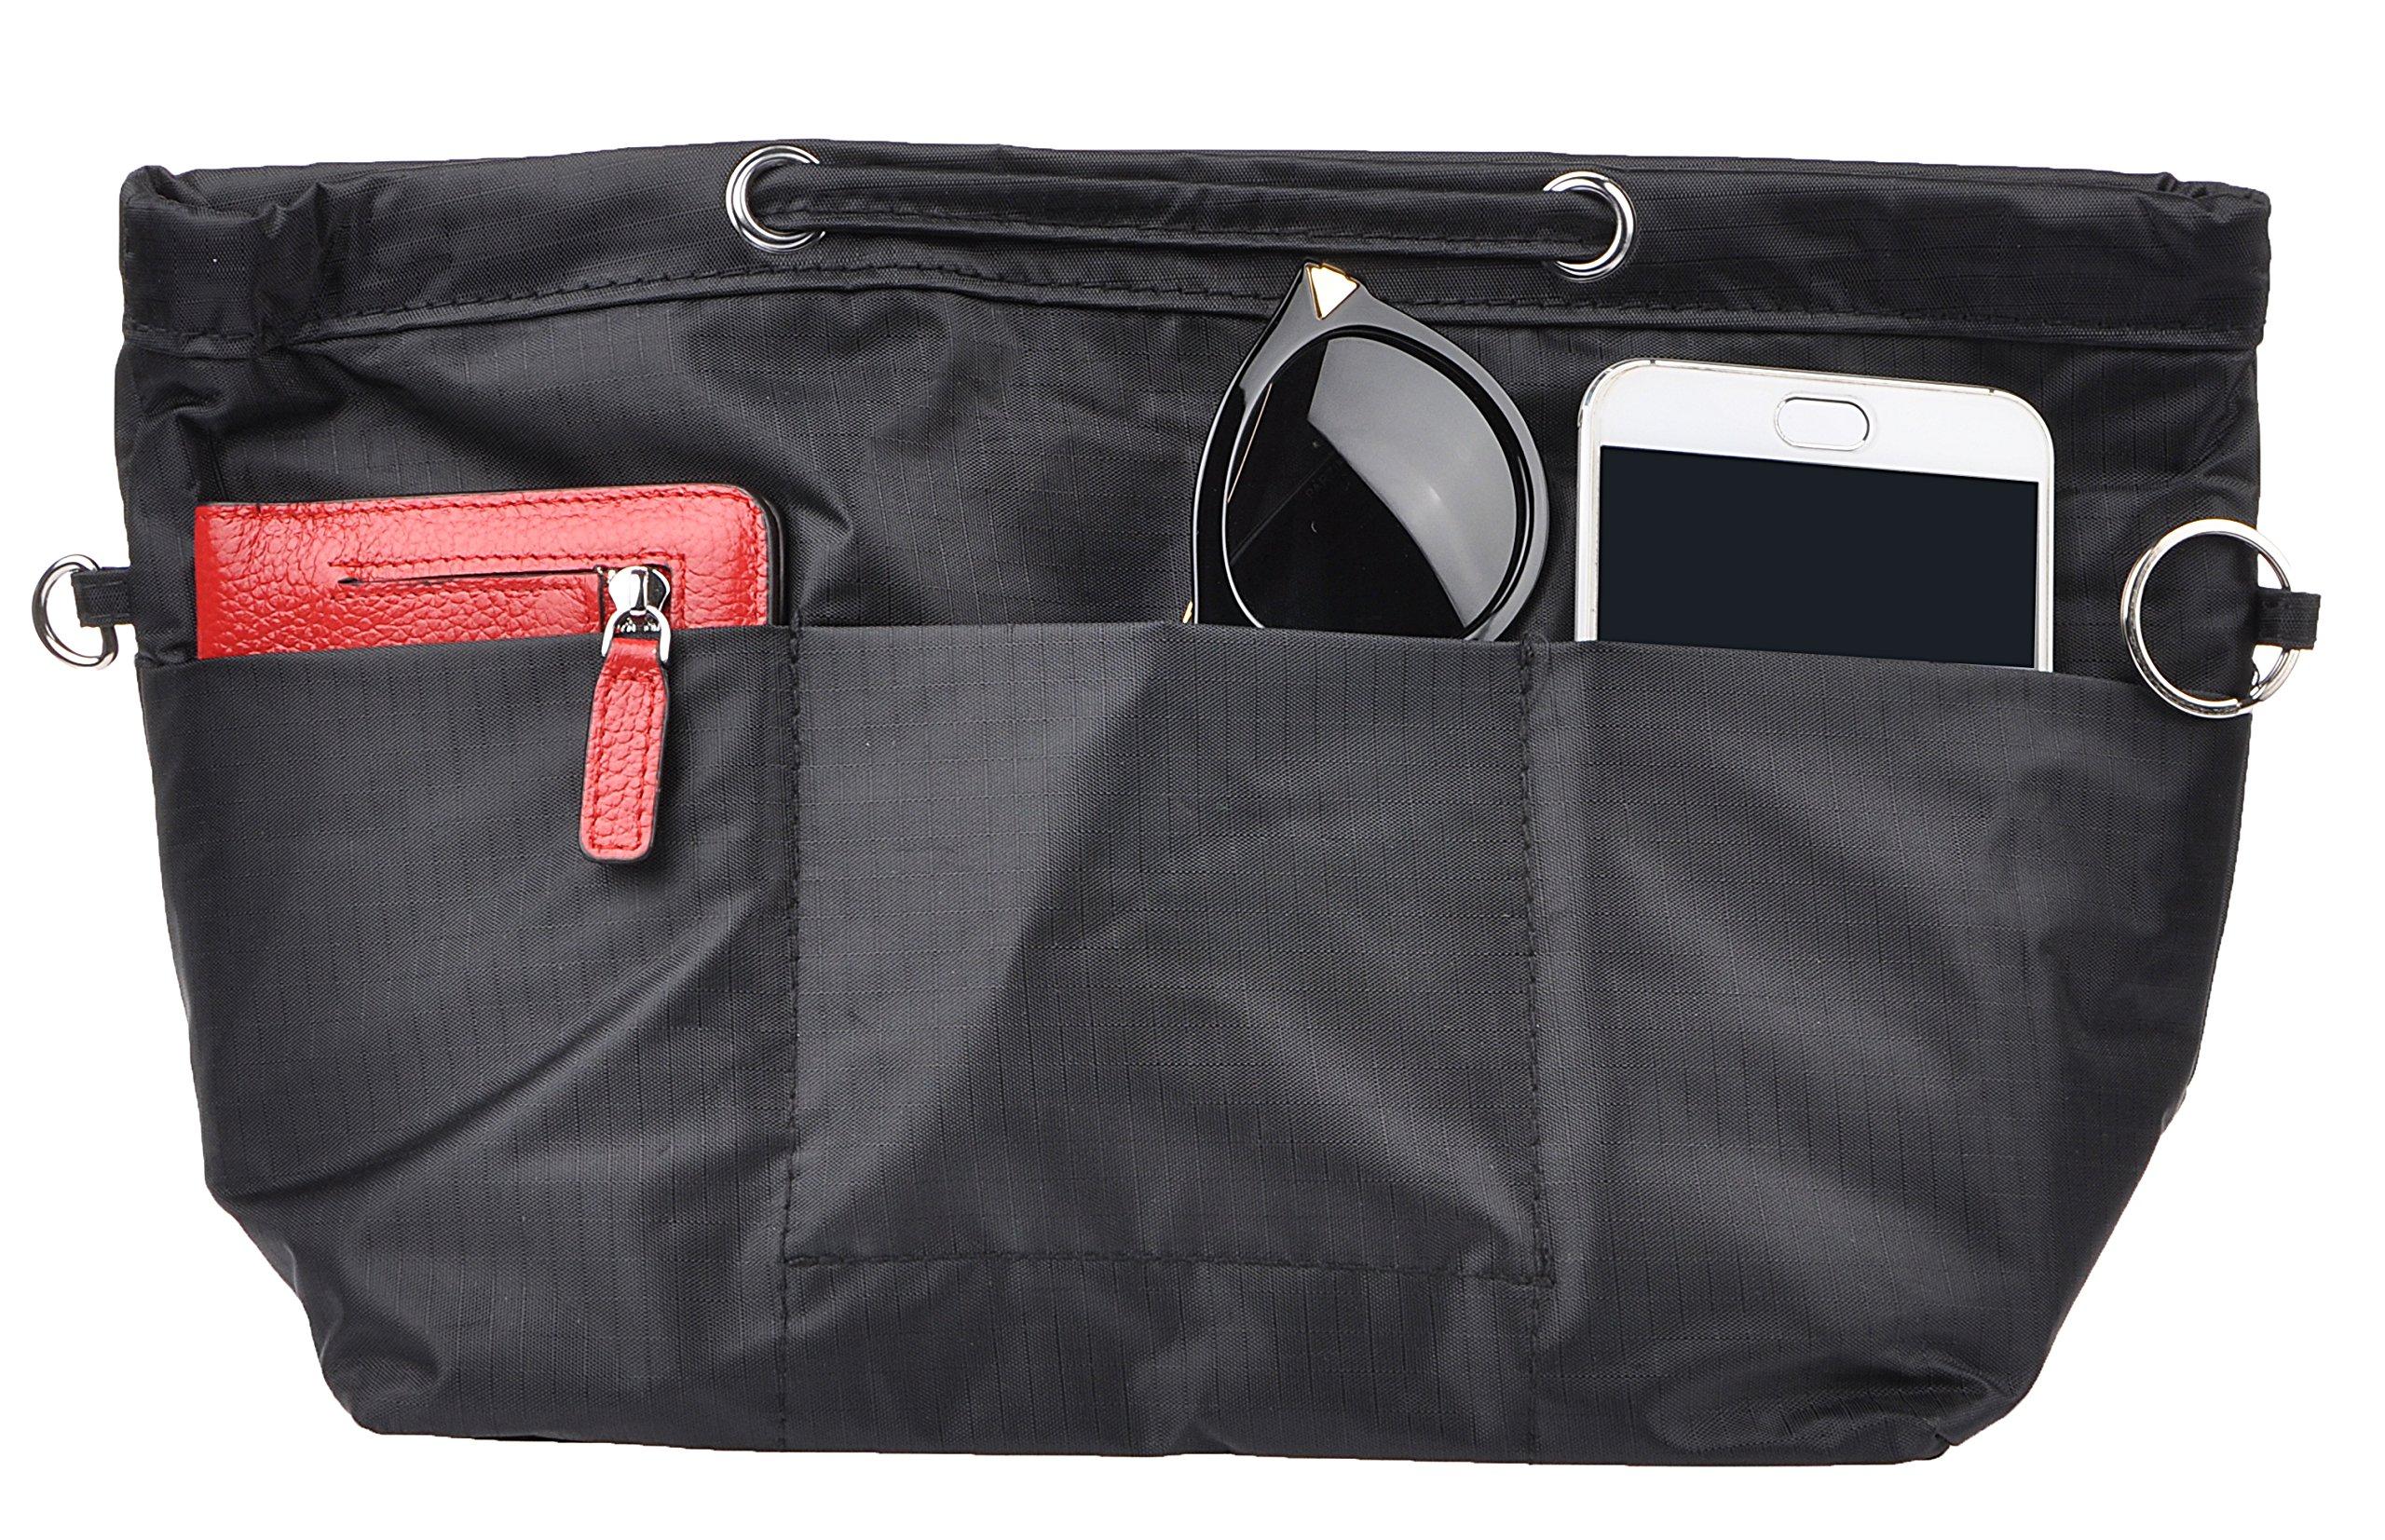 Vercord Oxford Handbag Purse Tote Pocketbook Insert Organizer With Handle 2 Sizes, Black M